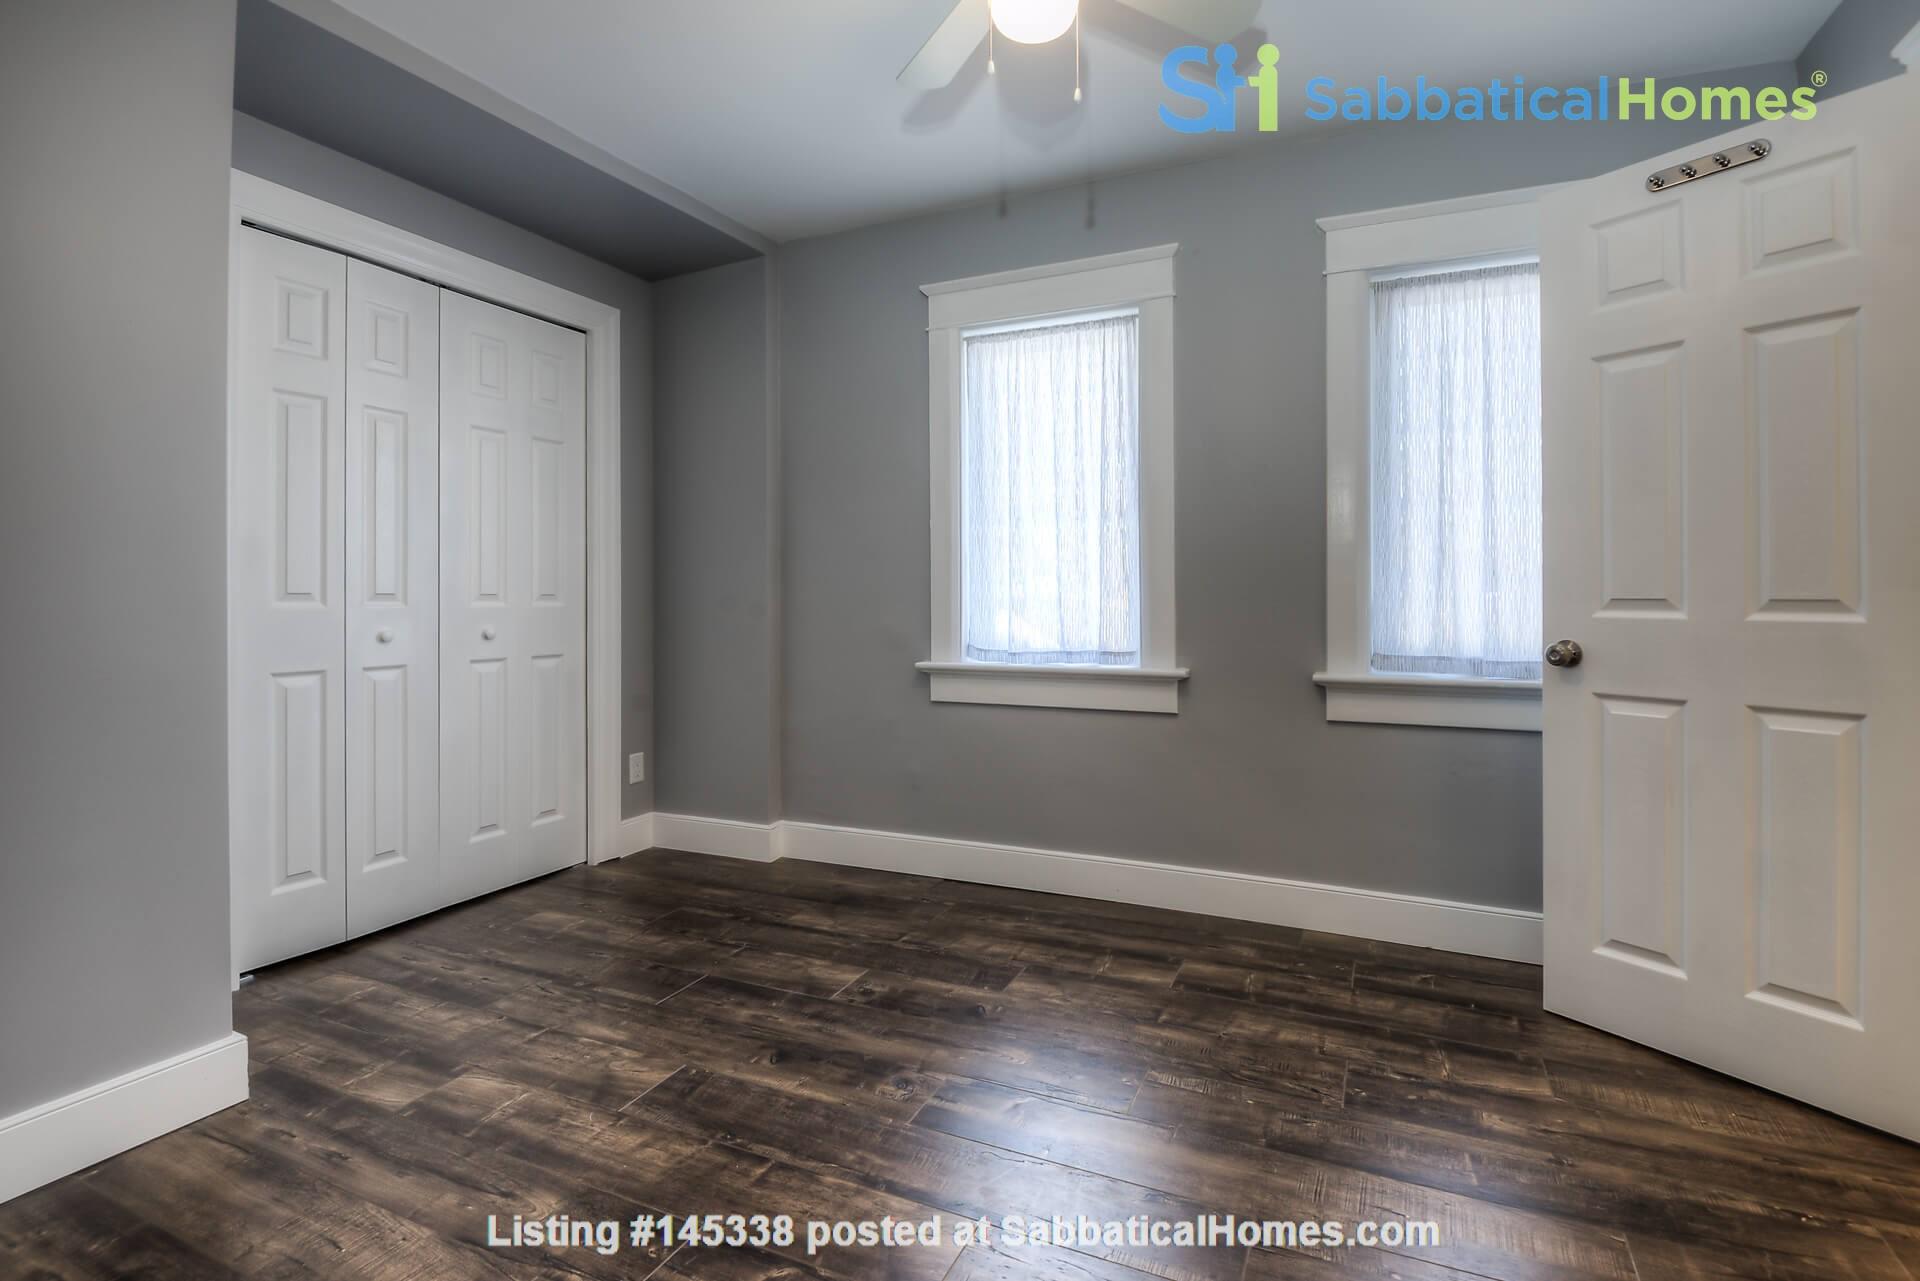 3 bdrm home (unfurnished) - downtown Kitchener-Waterloo Home Rental in Kitchener, Ontario, Canada 2